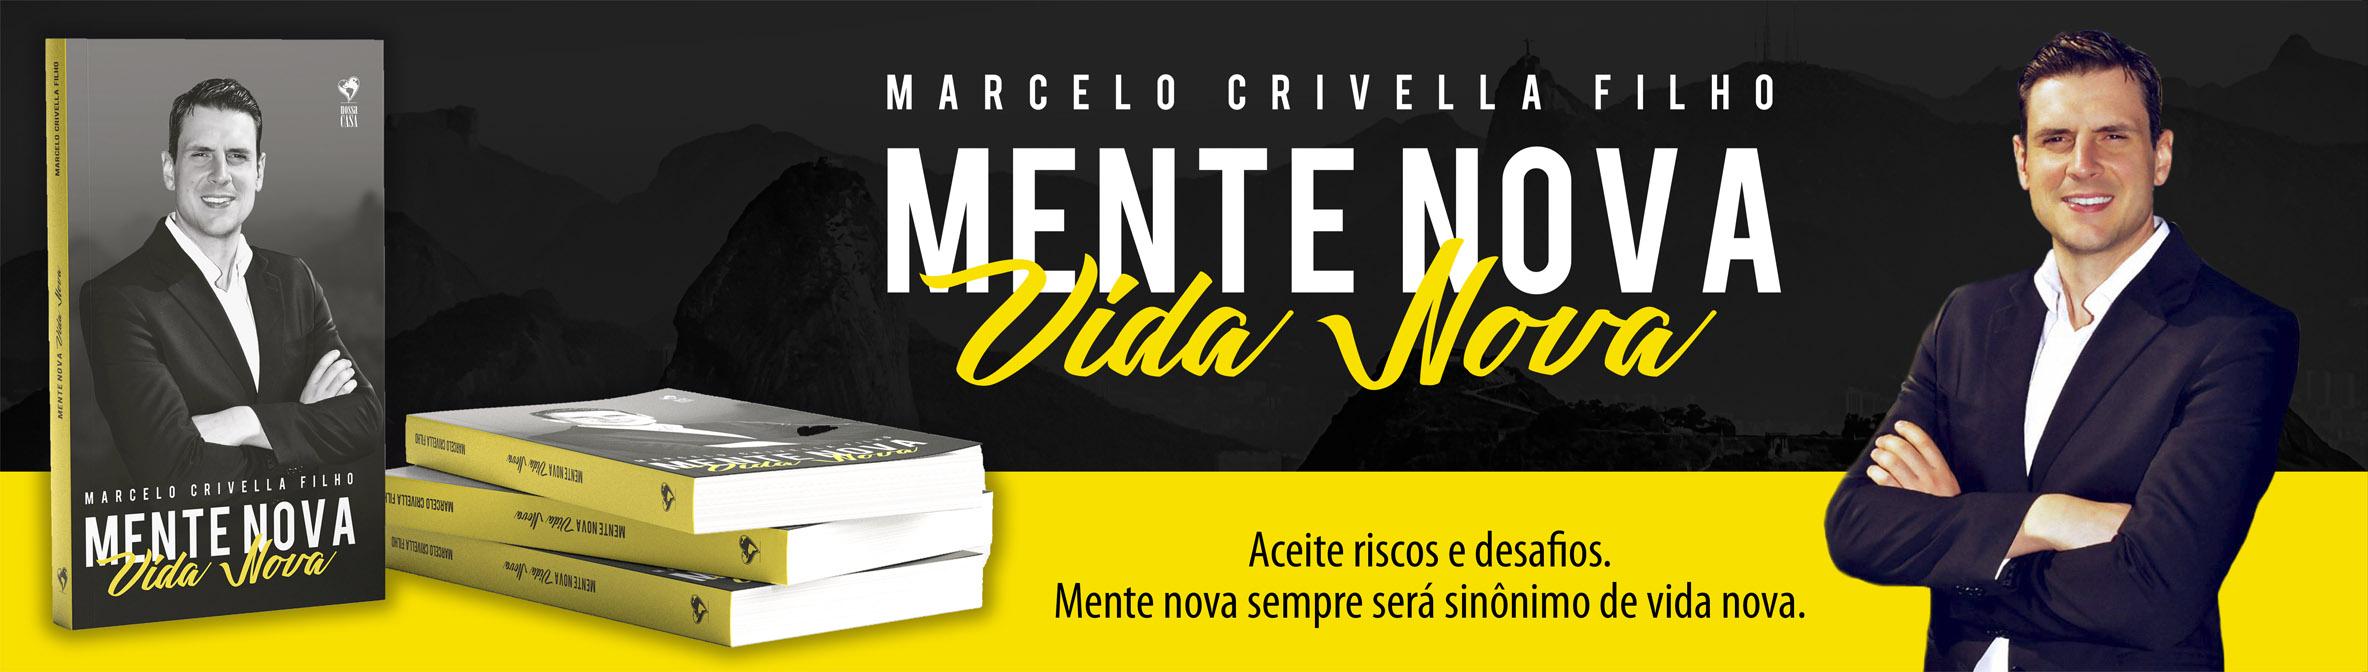 Livro Mente Nova, Vida Nova